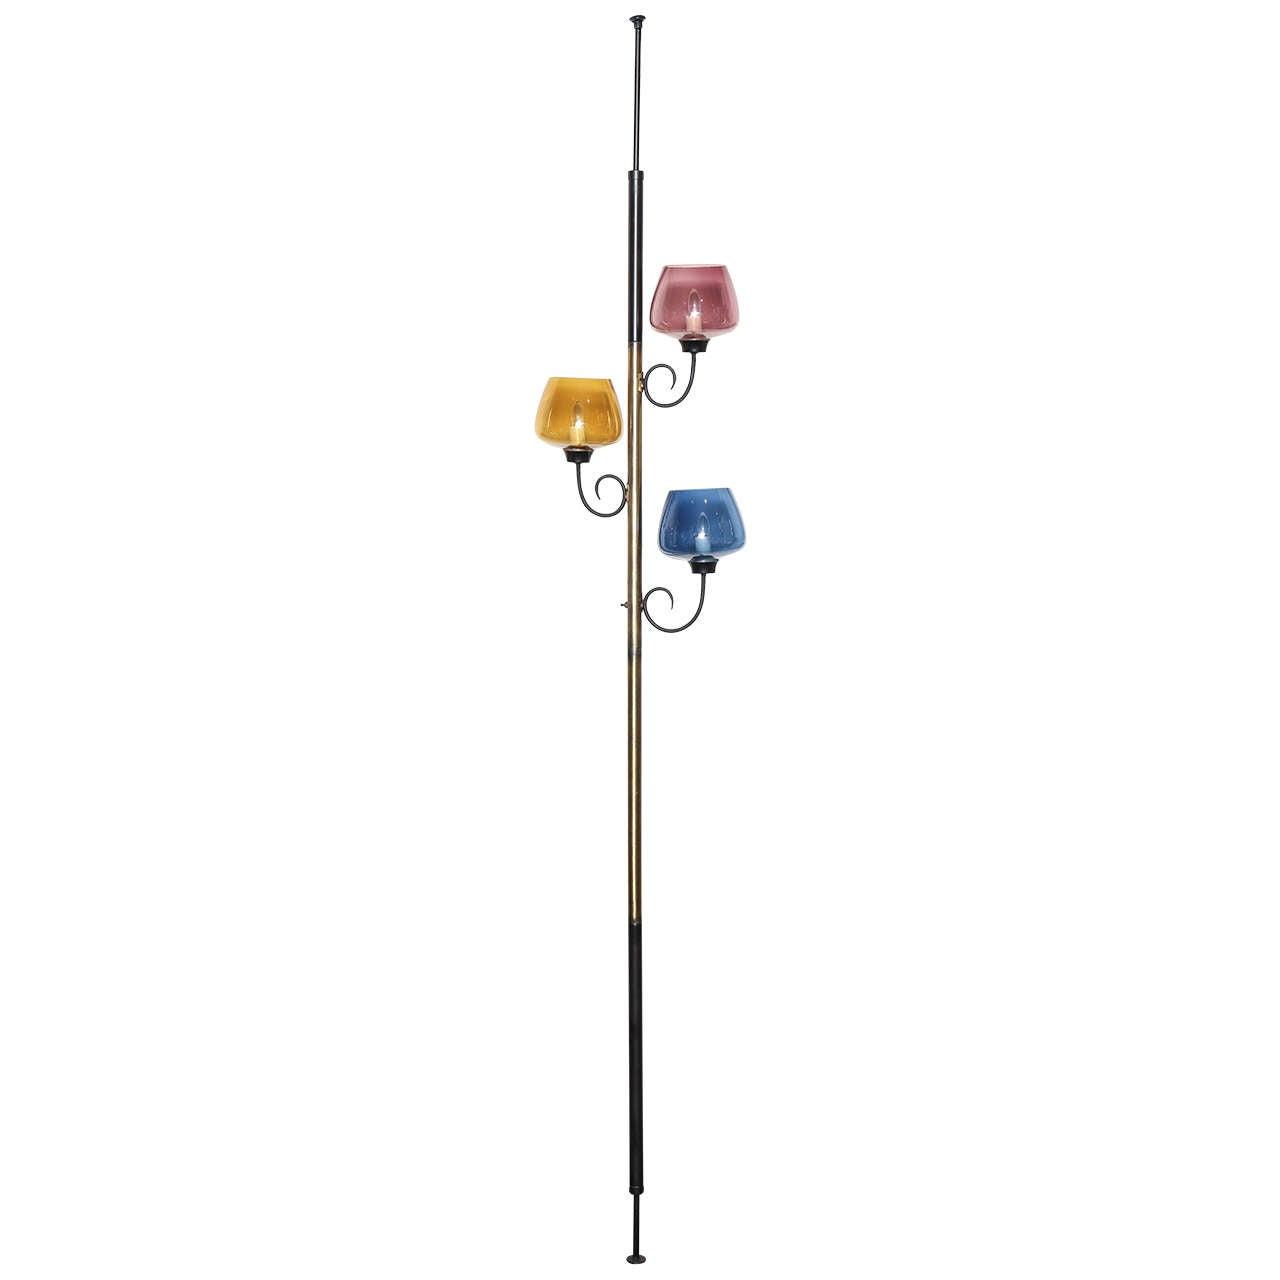 mid century modern murano glass pole lamp at 1stdibs. Black Bedroom Furniture Sets. Home Design Ideas